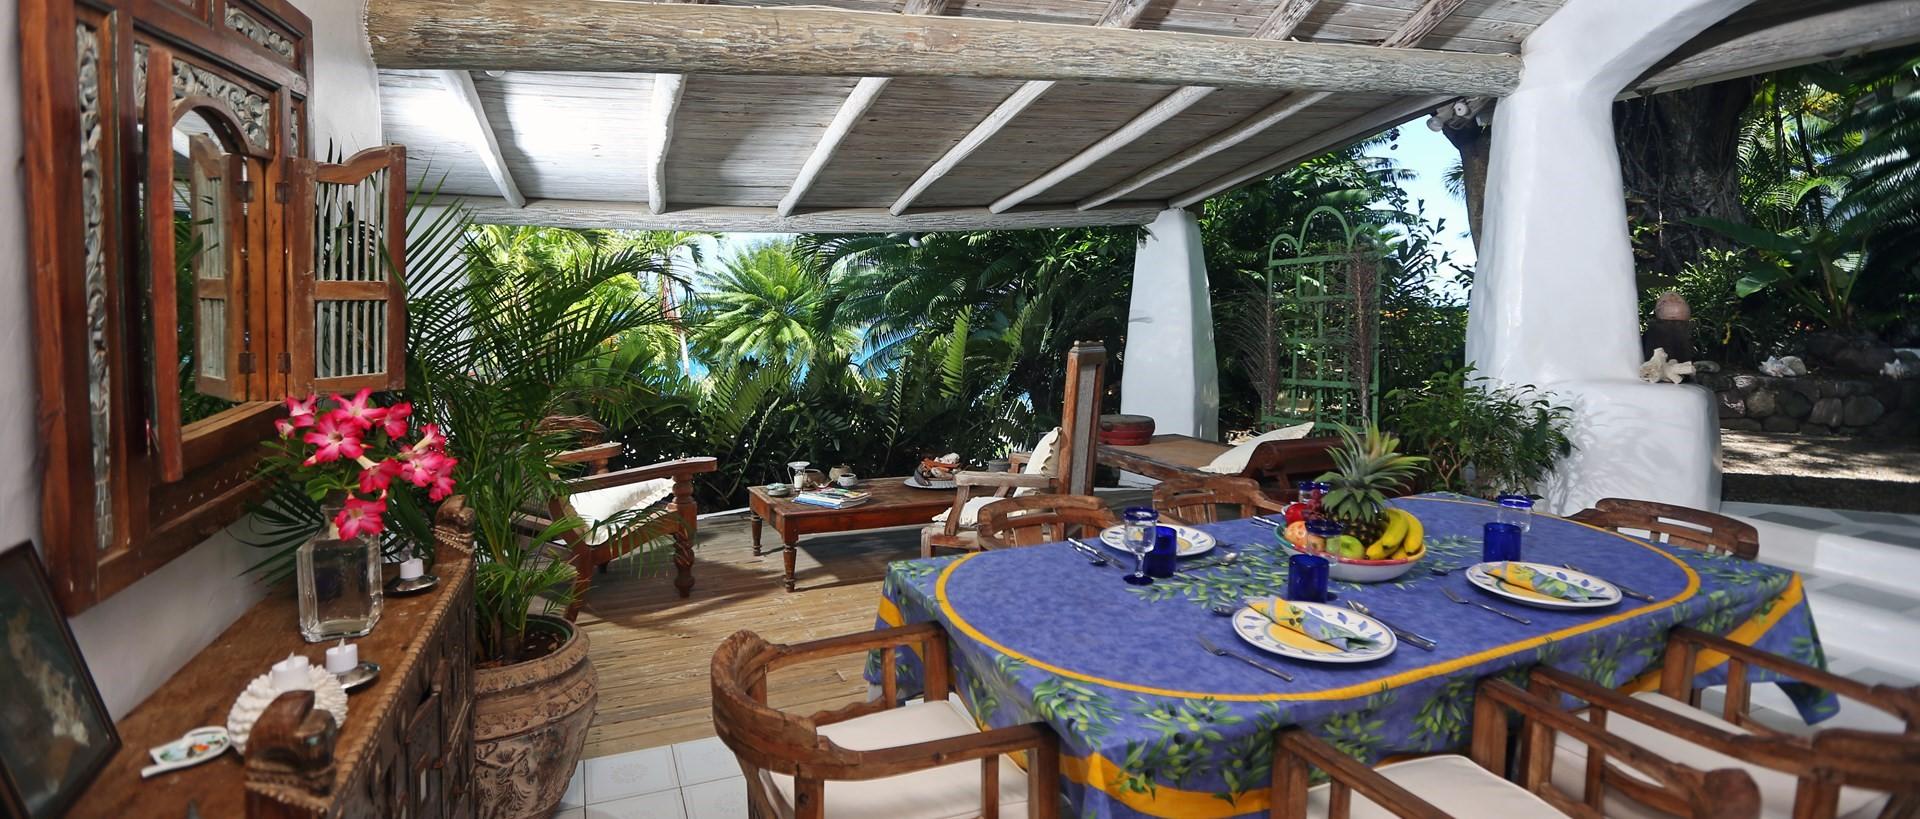 smugglers-nest-villa-al-fresco-dining